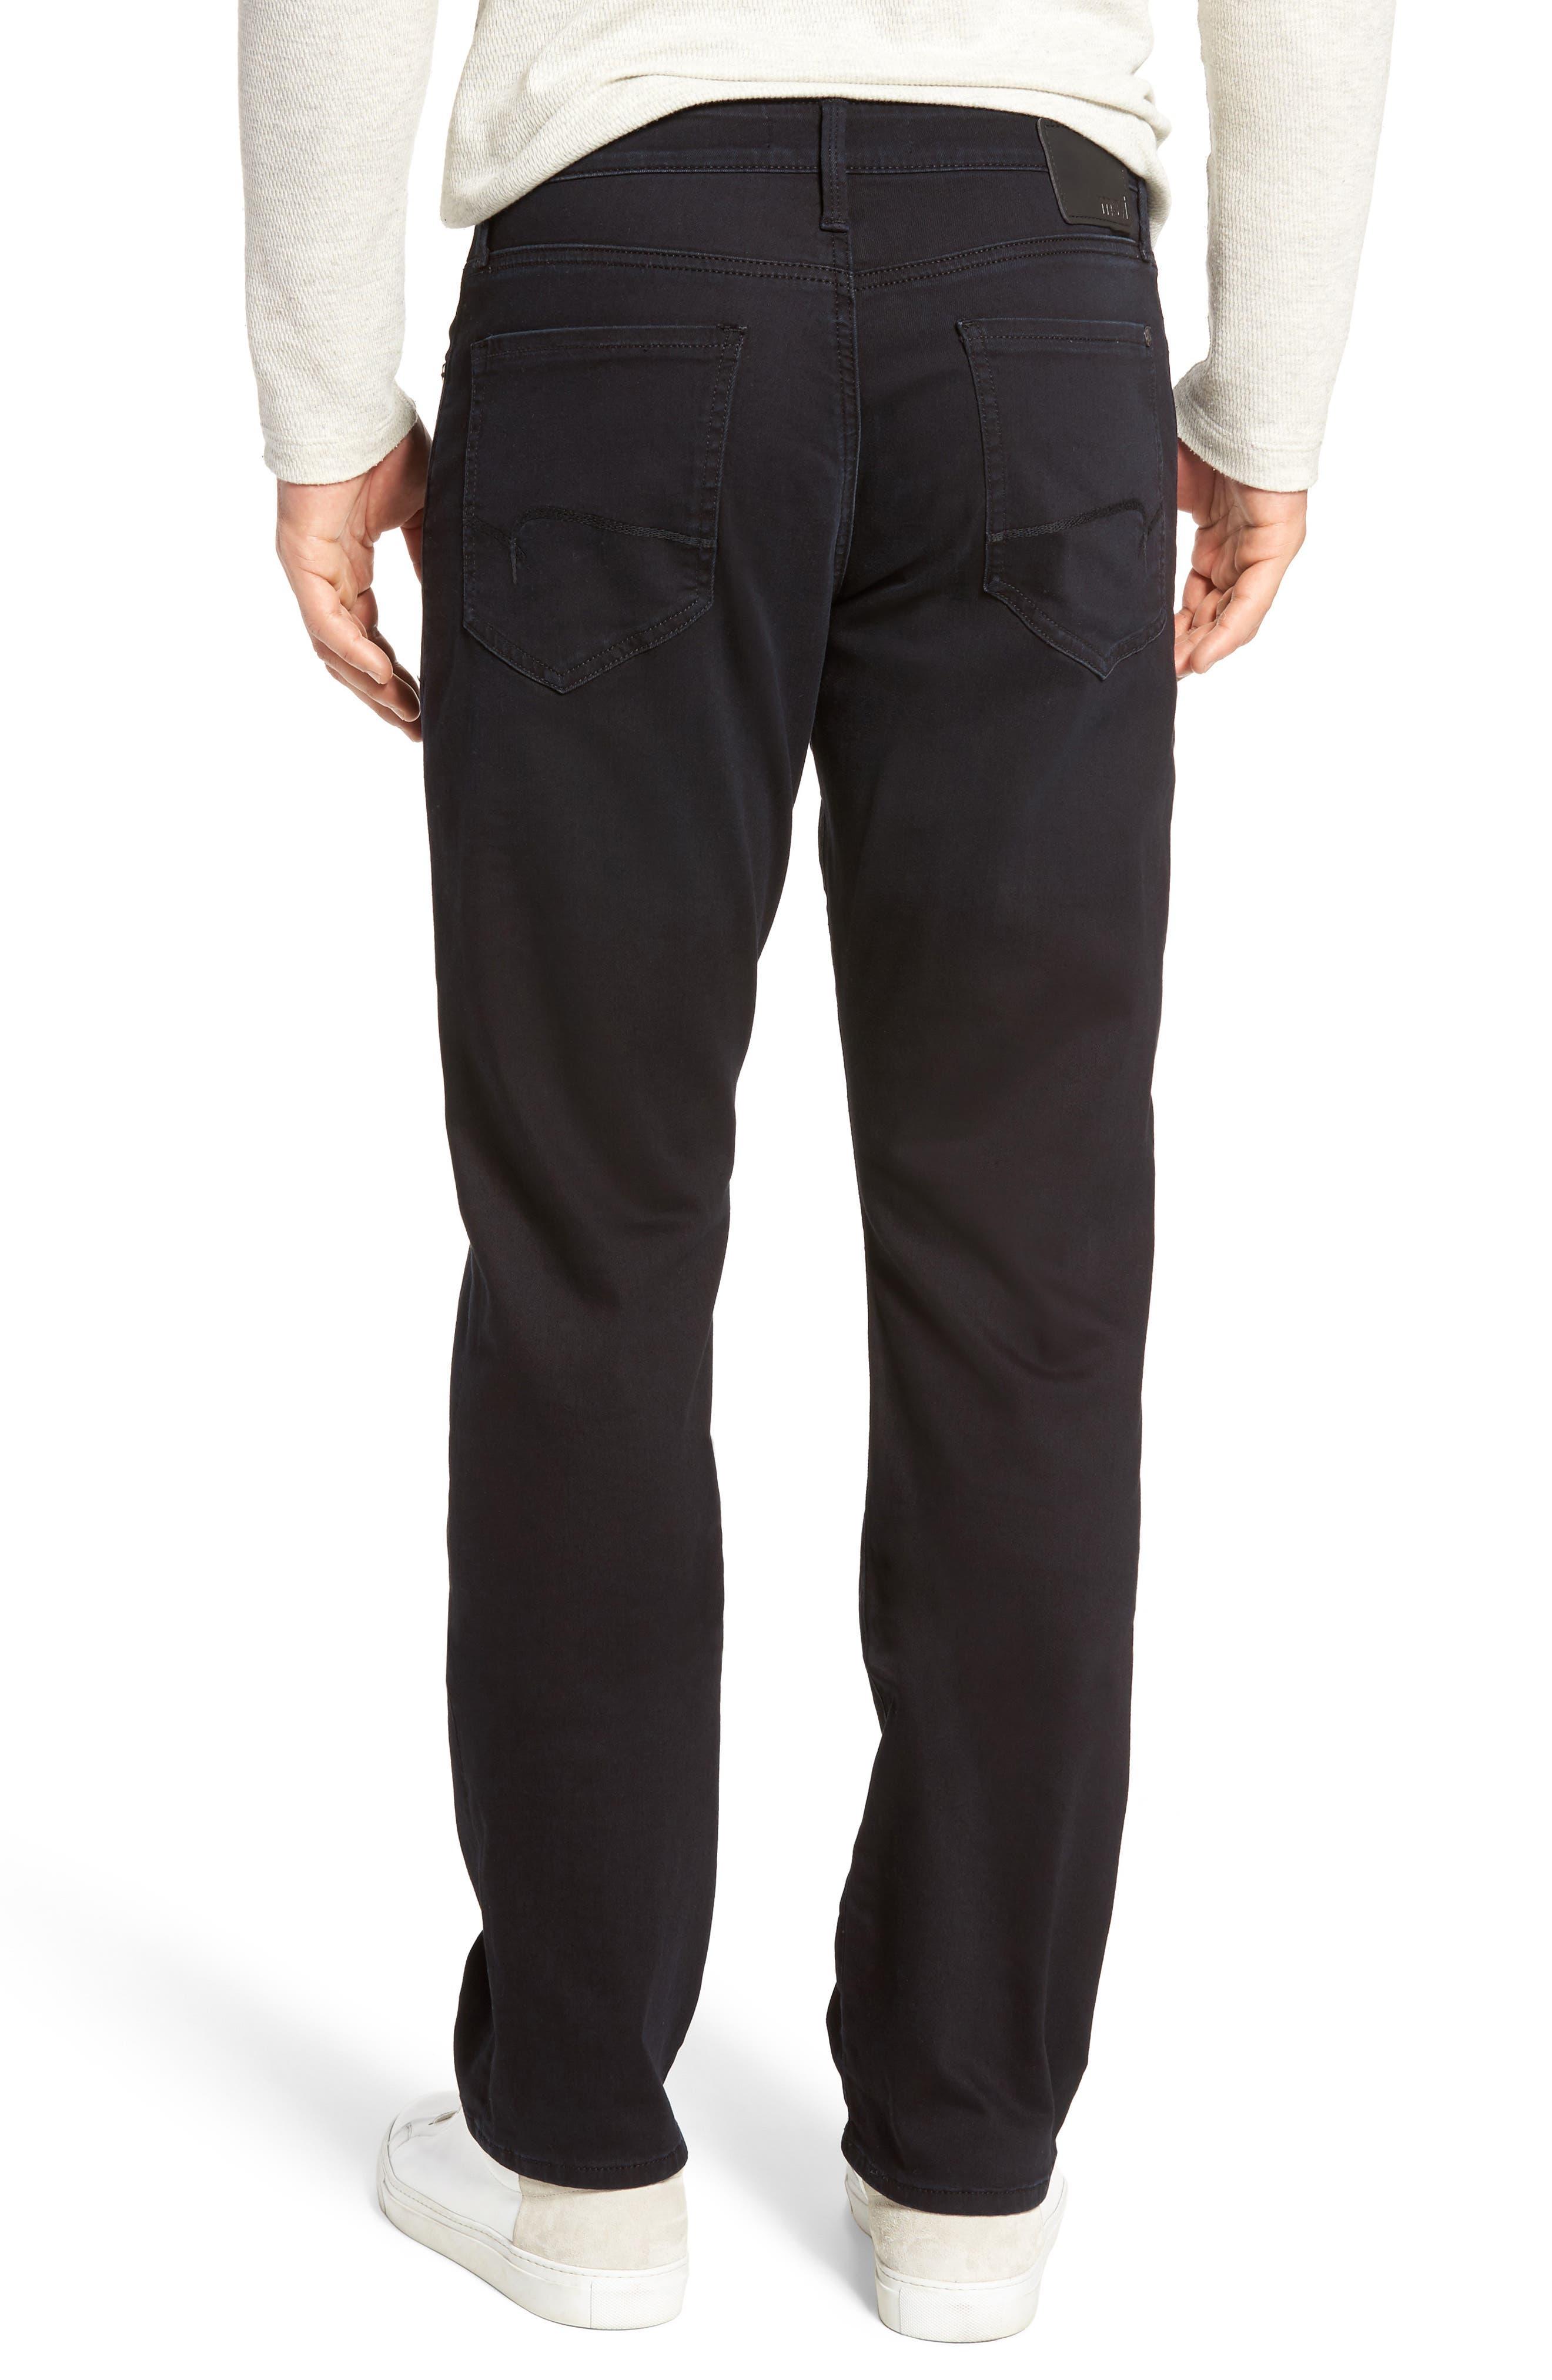 Matt Relaxed Fit Jeans,                             Alternate thumbnail 2, color,                             Blue Black